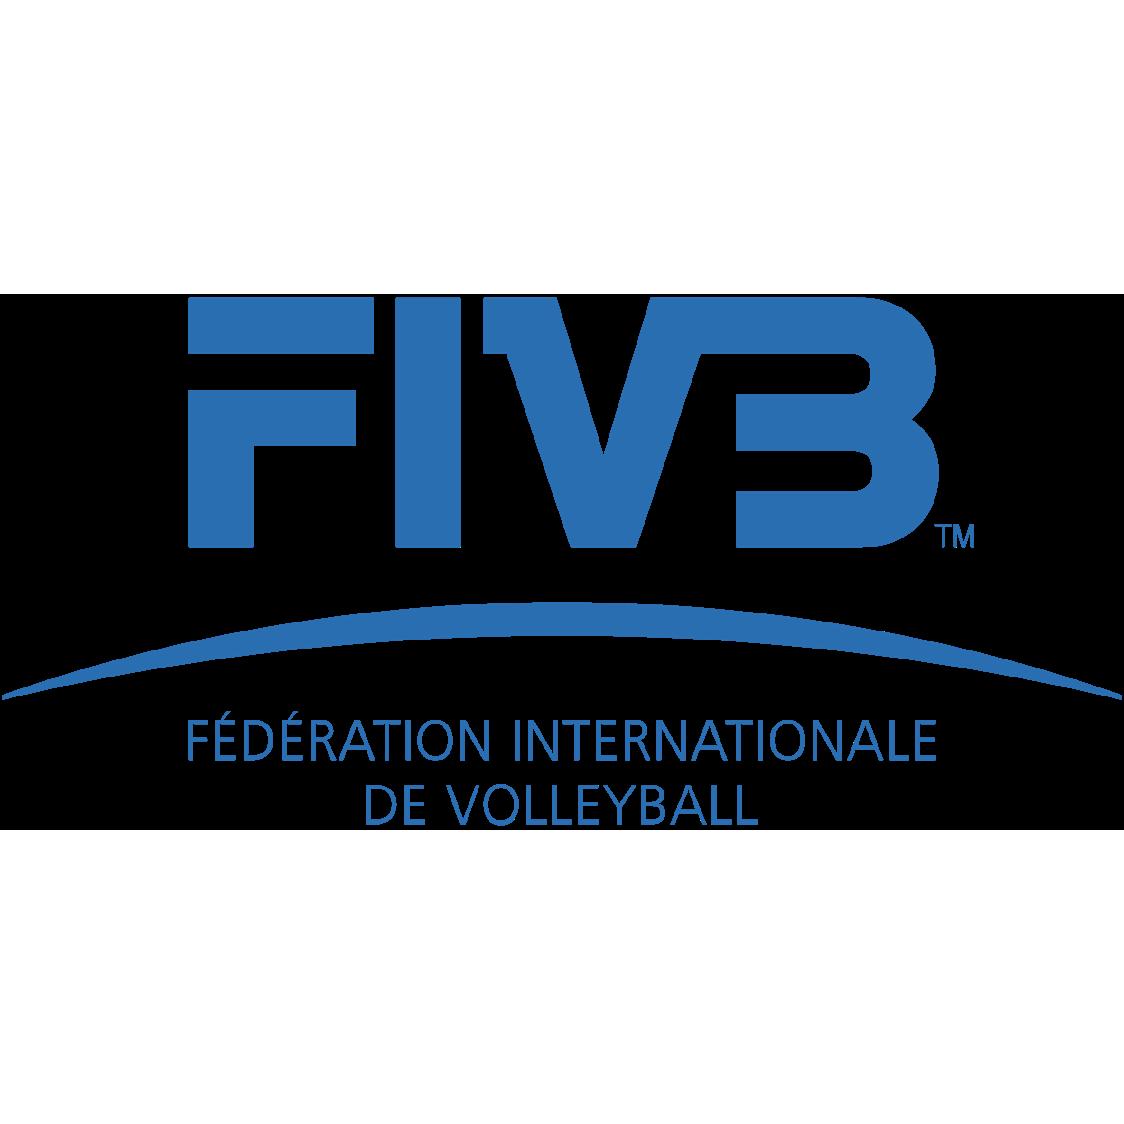 2022 FIVB Volleyball Men's World Championship